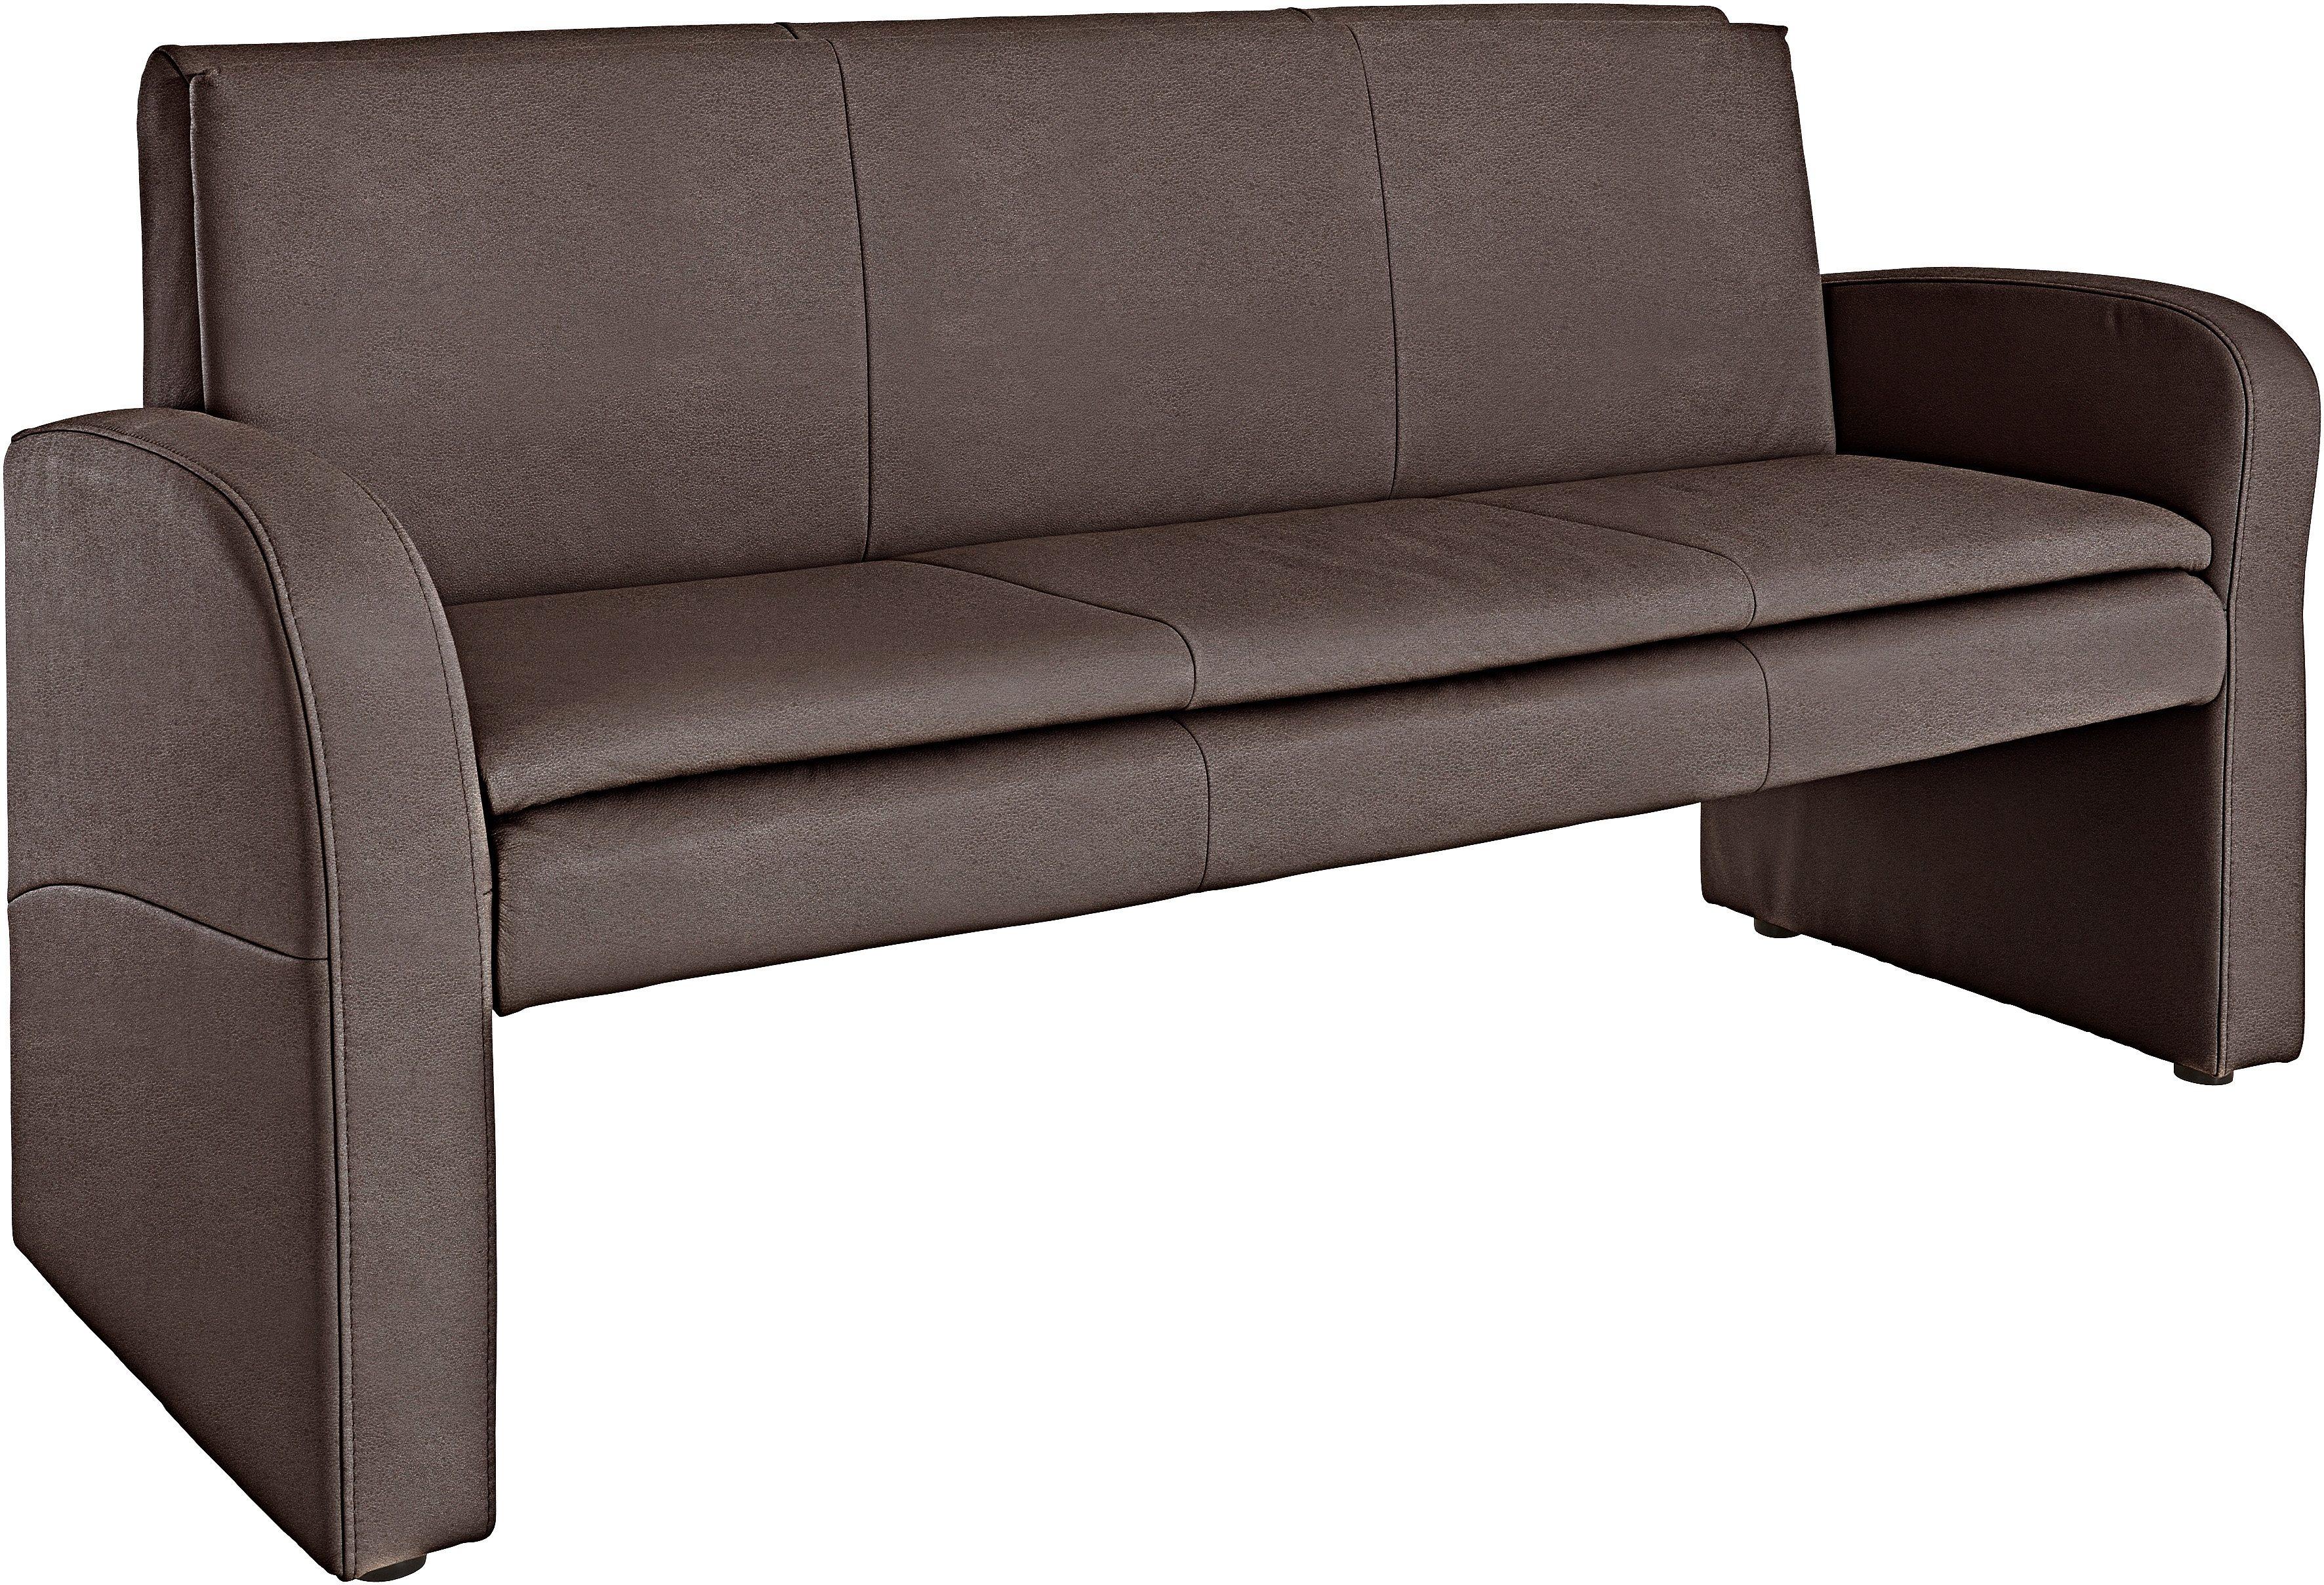 Image of exxpo - sofa fashion Hockerbank